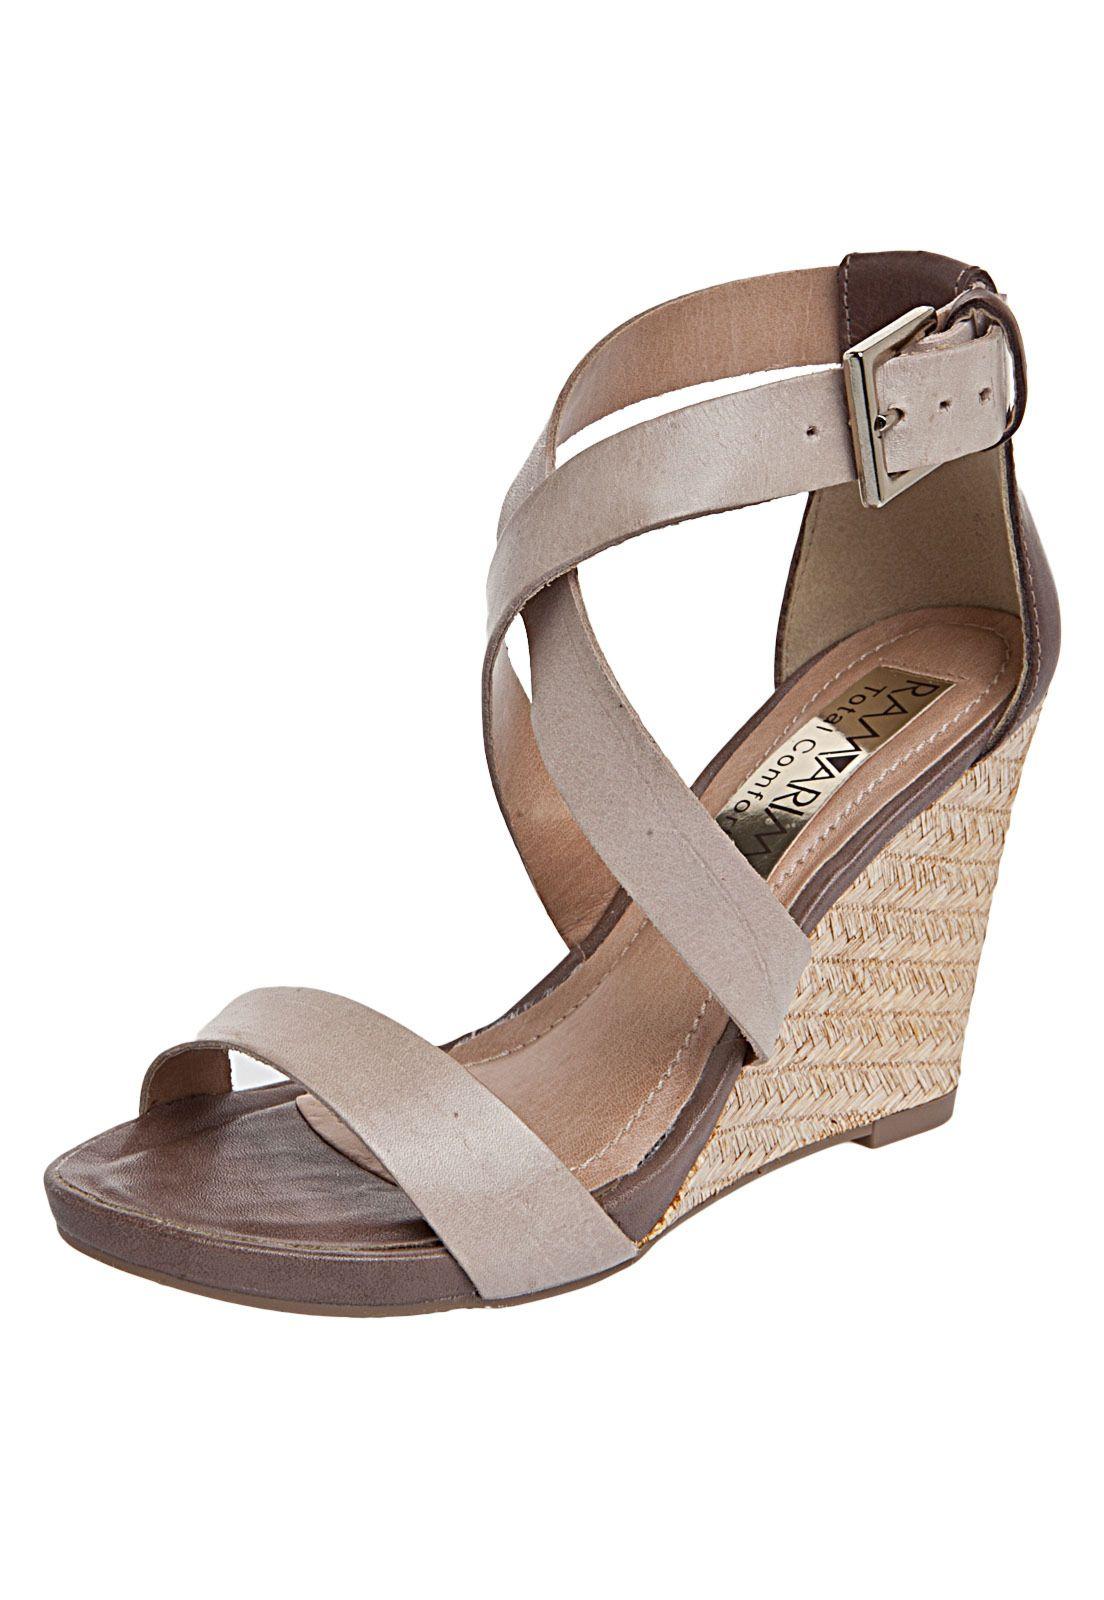 d8952e93c Sandália Ramarim Tiras Bege   Sapatos femininos   Sandalias ramarim ...